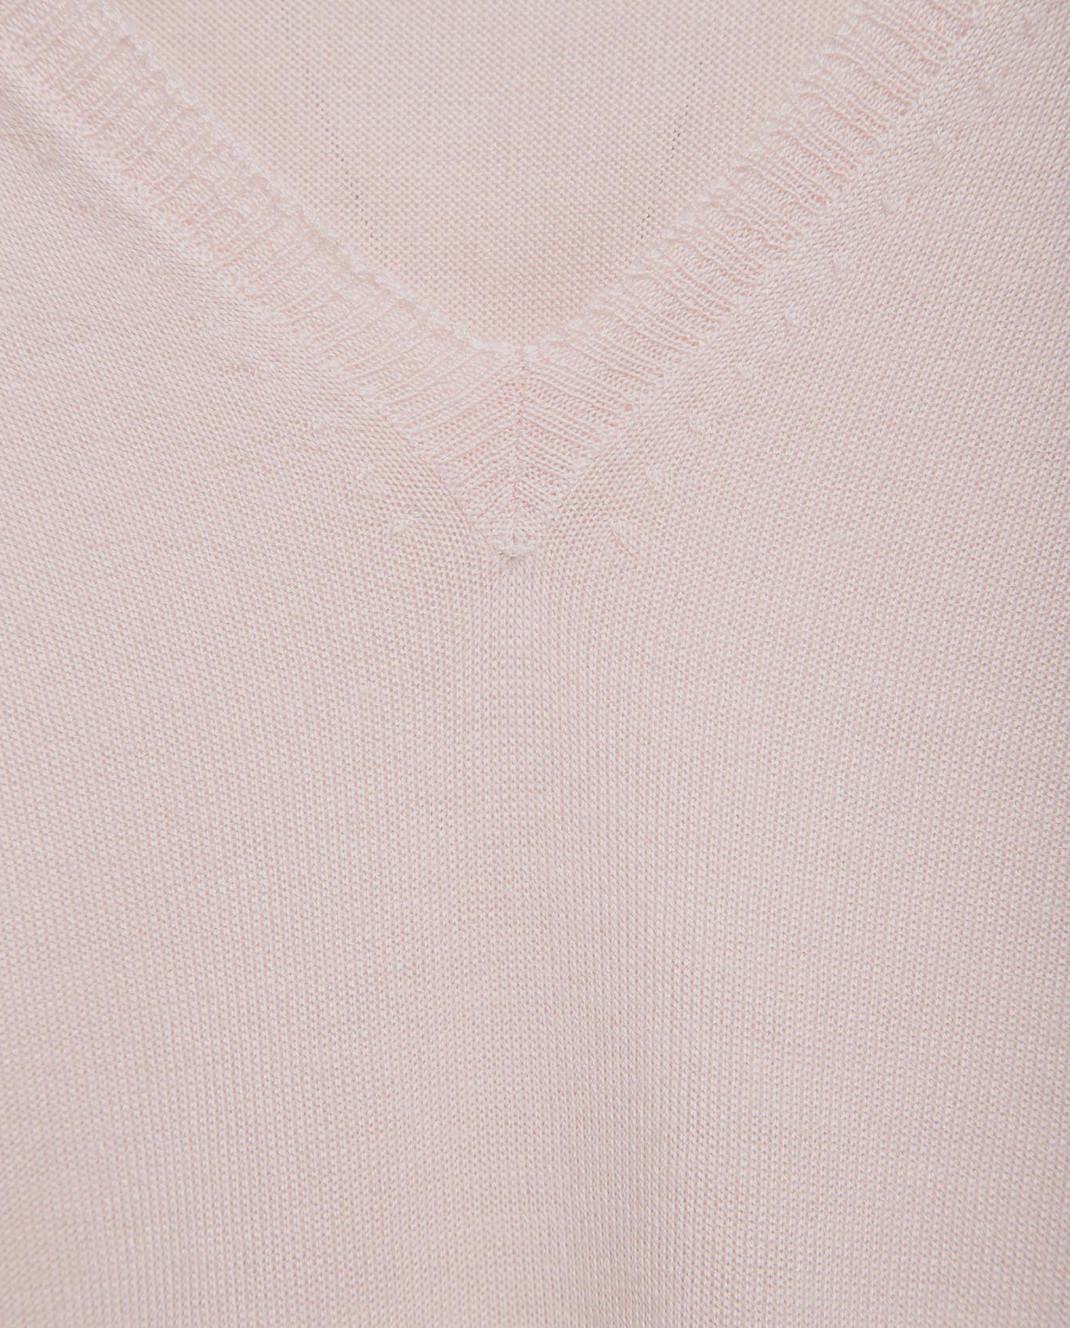 COLOMBO Пуловер из кашемира MA02735 изображение 5